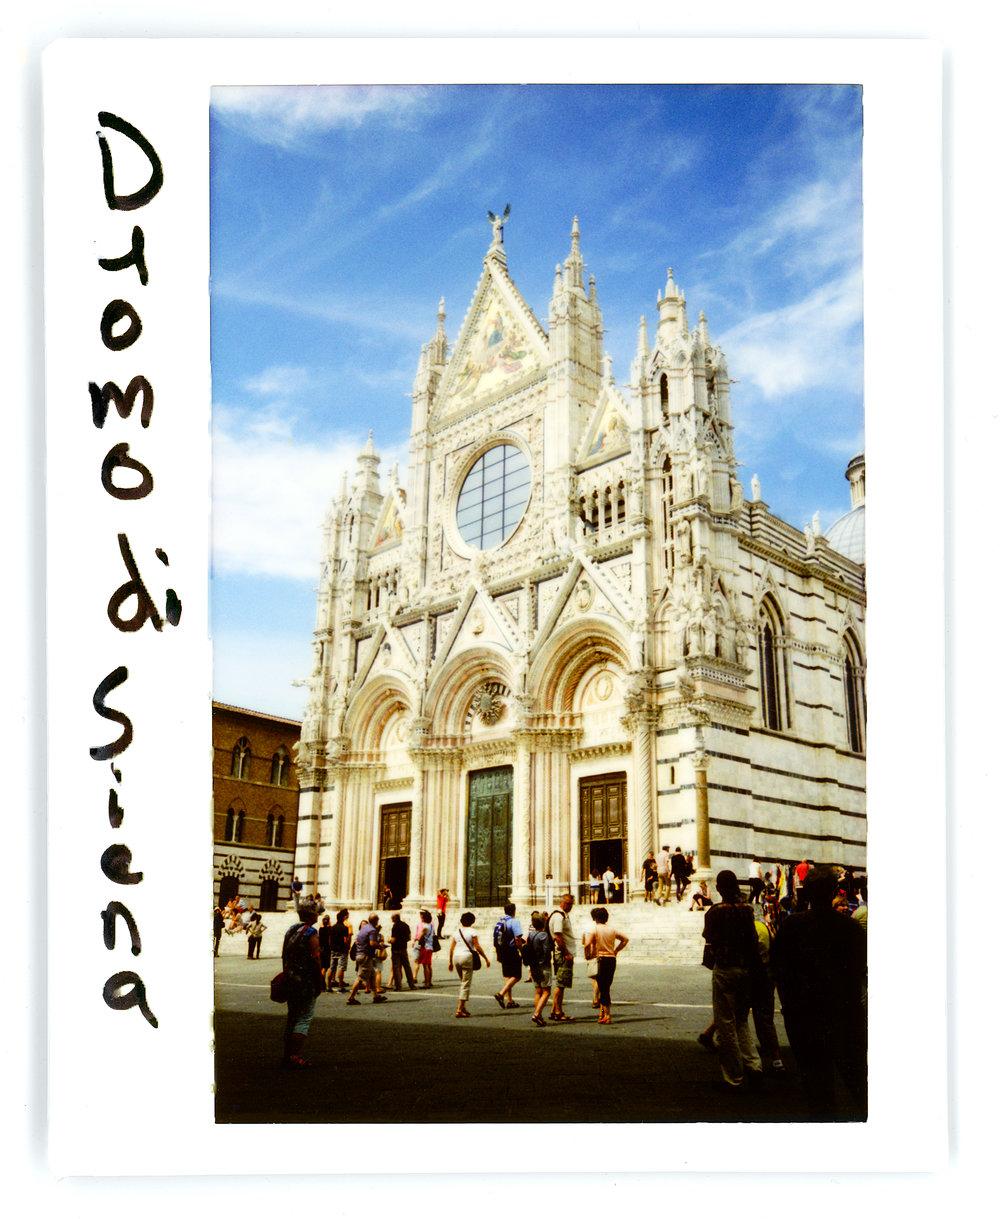 21_Duomo_di_Siena copy.jpg